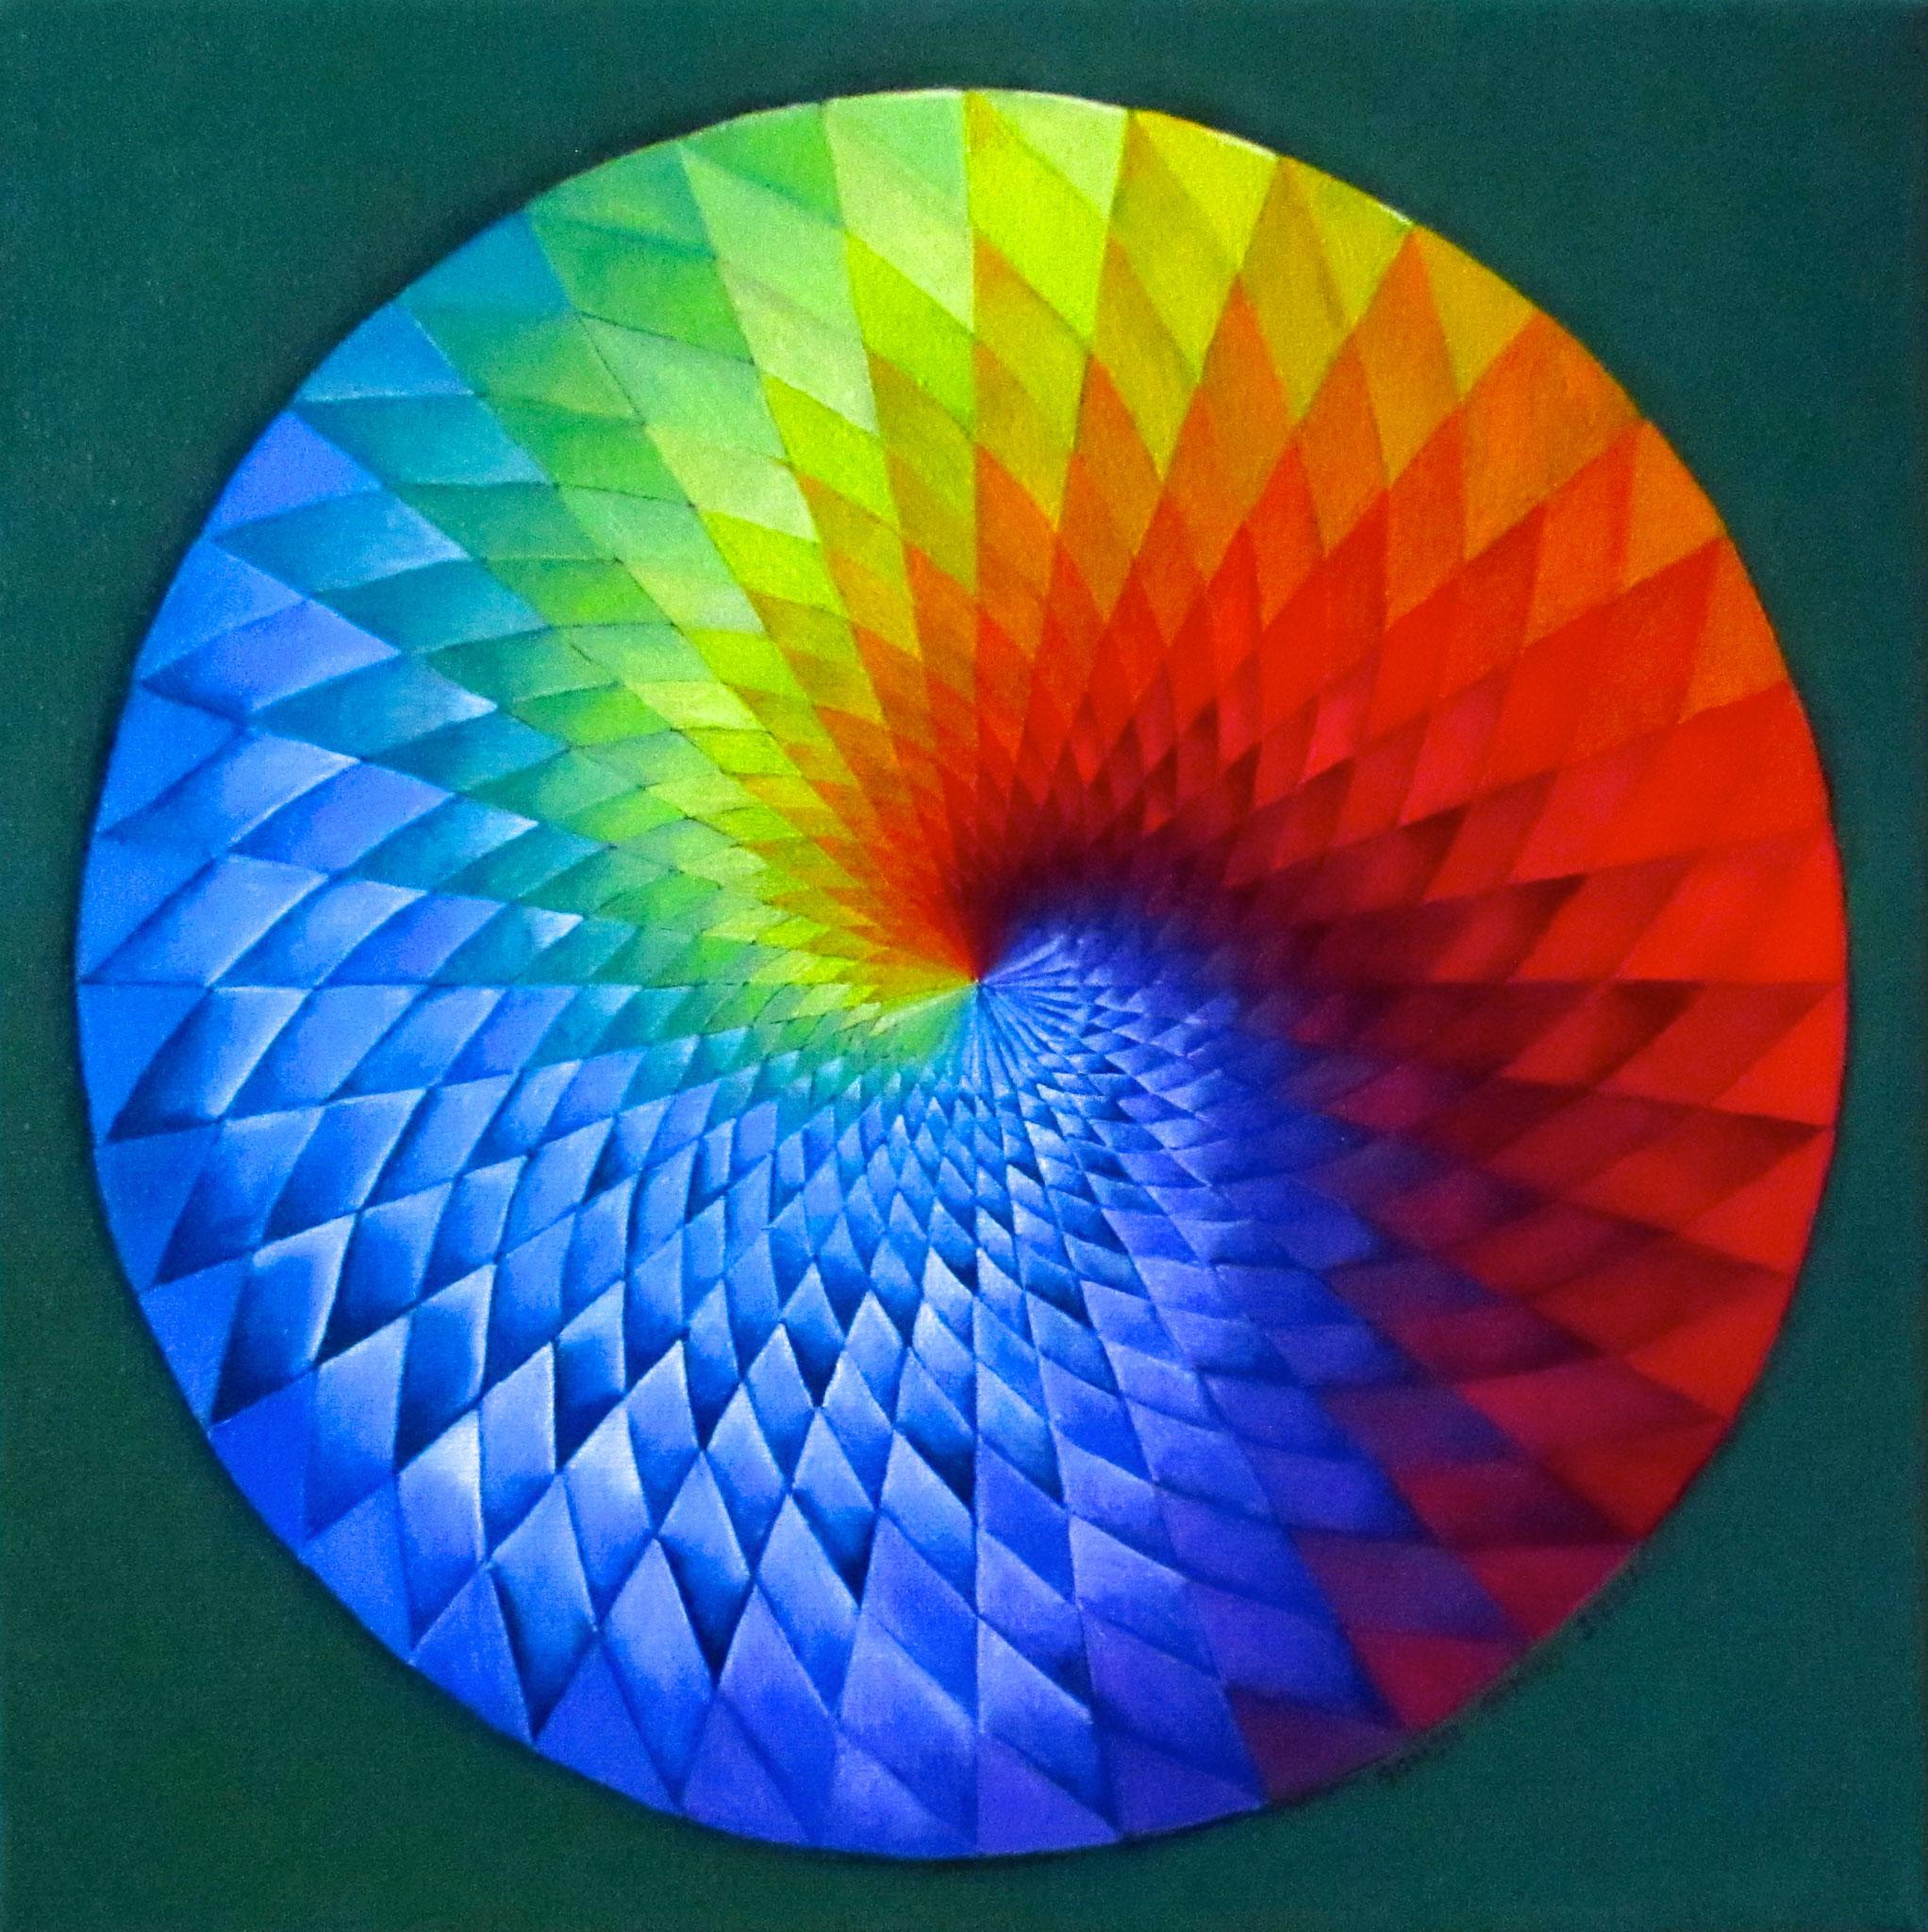 Rainbow Spiral, oil on canvas 12x12, March 2017 (3)